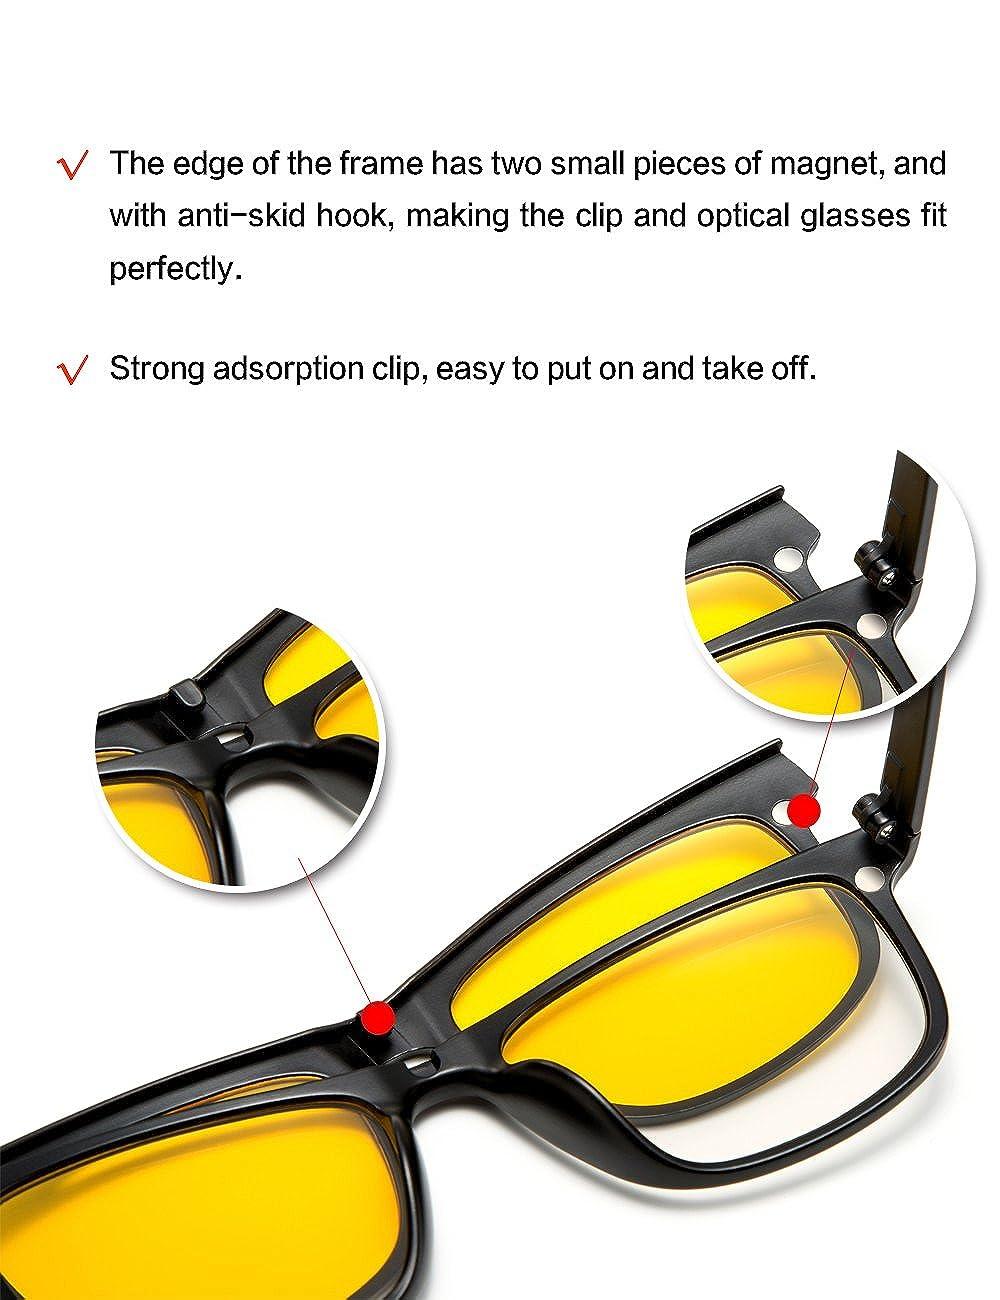 18642d82201b Amazon.com  WELUK Magnetic 5Pcs Polarized Clip-on Sunglasses Plastic  Eyeglasses Frame for Night Driving (Black